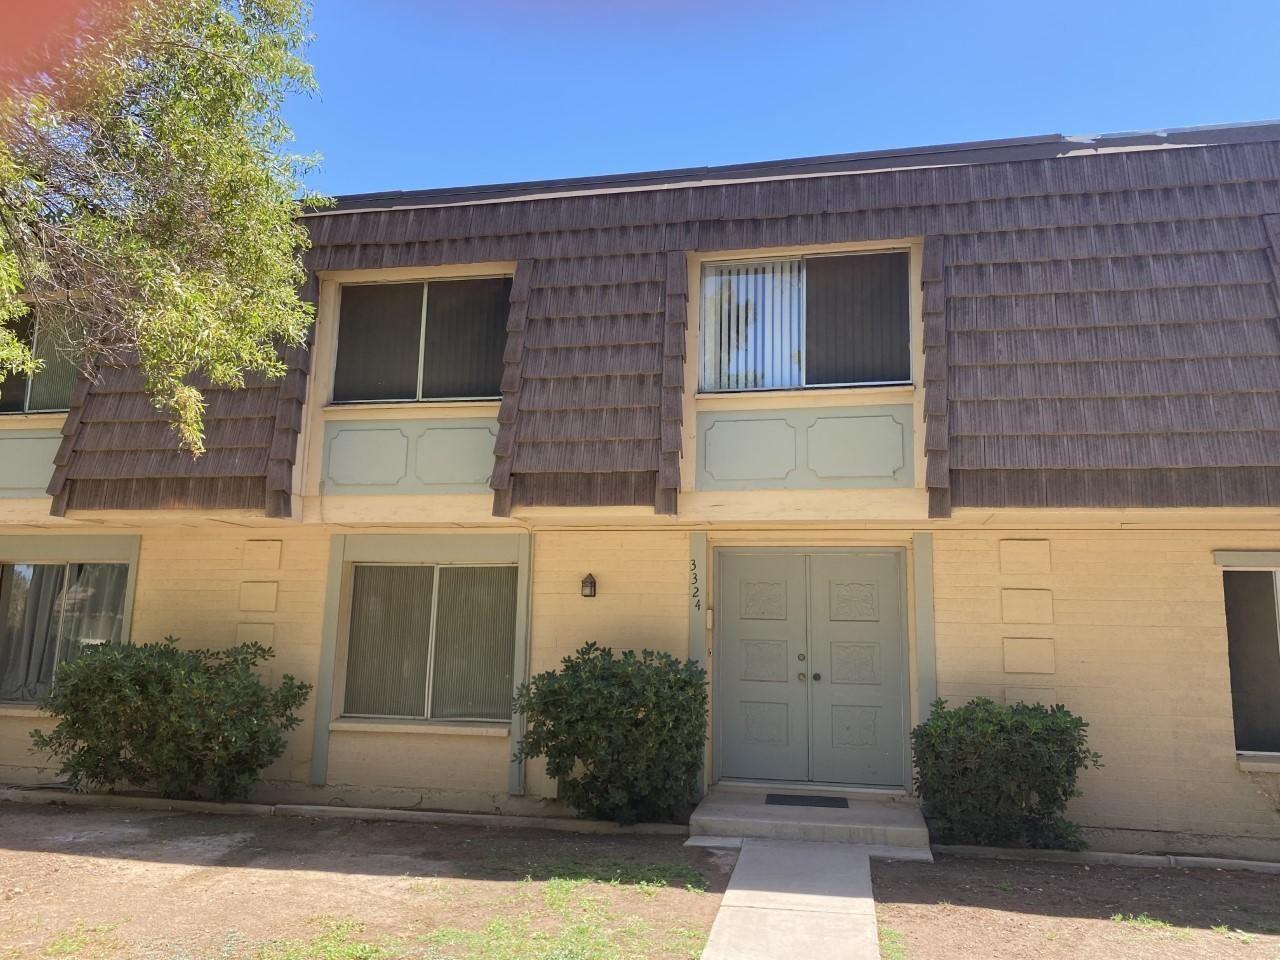 Photo of 3324 S JUNIPER Street, Tempe, AZ 85282 (MLS # 6232207)